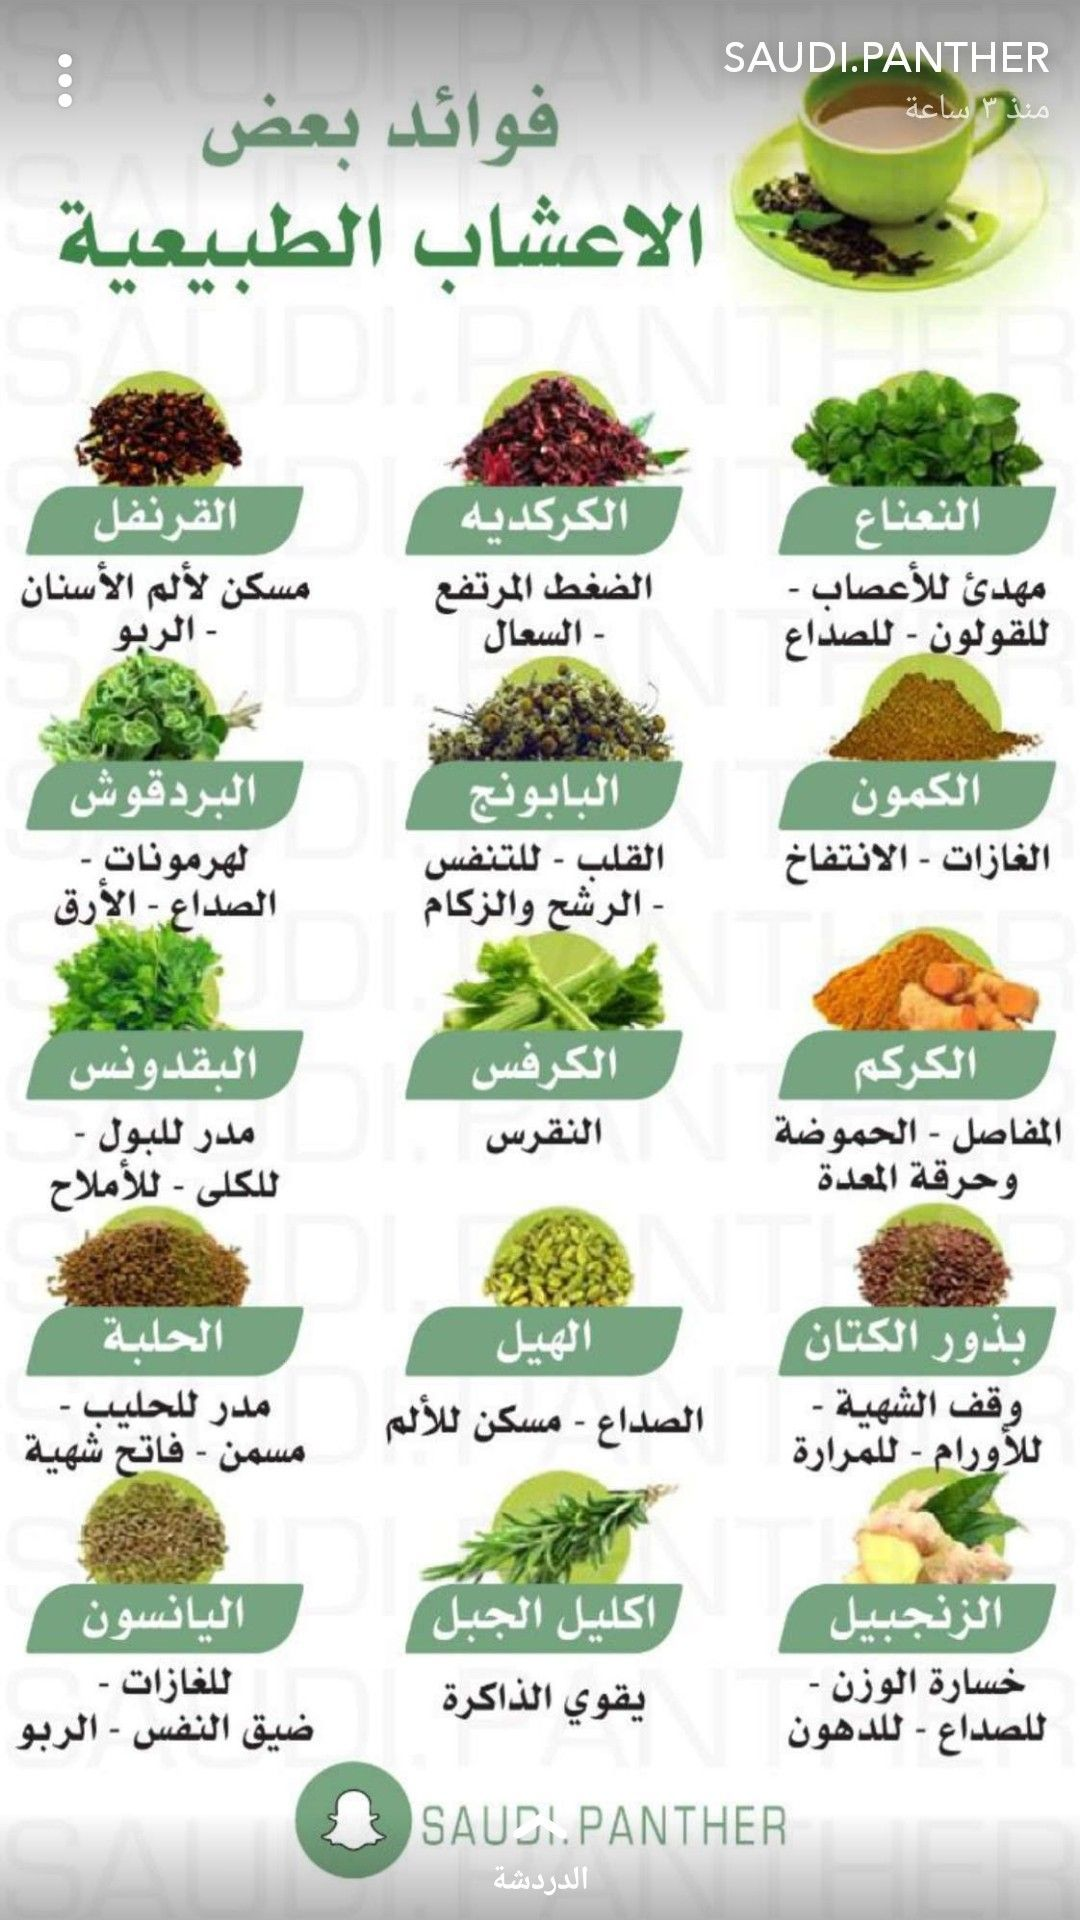 Pin By Hamd Saleh On صحة ووقاية Health Fitness Food Health Facts Food Health Fitness Nutrition